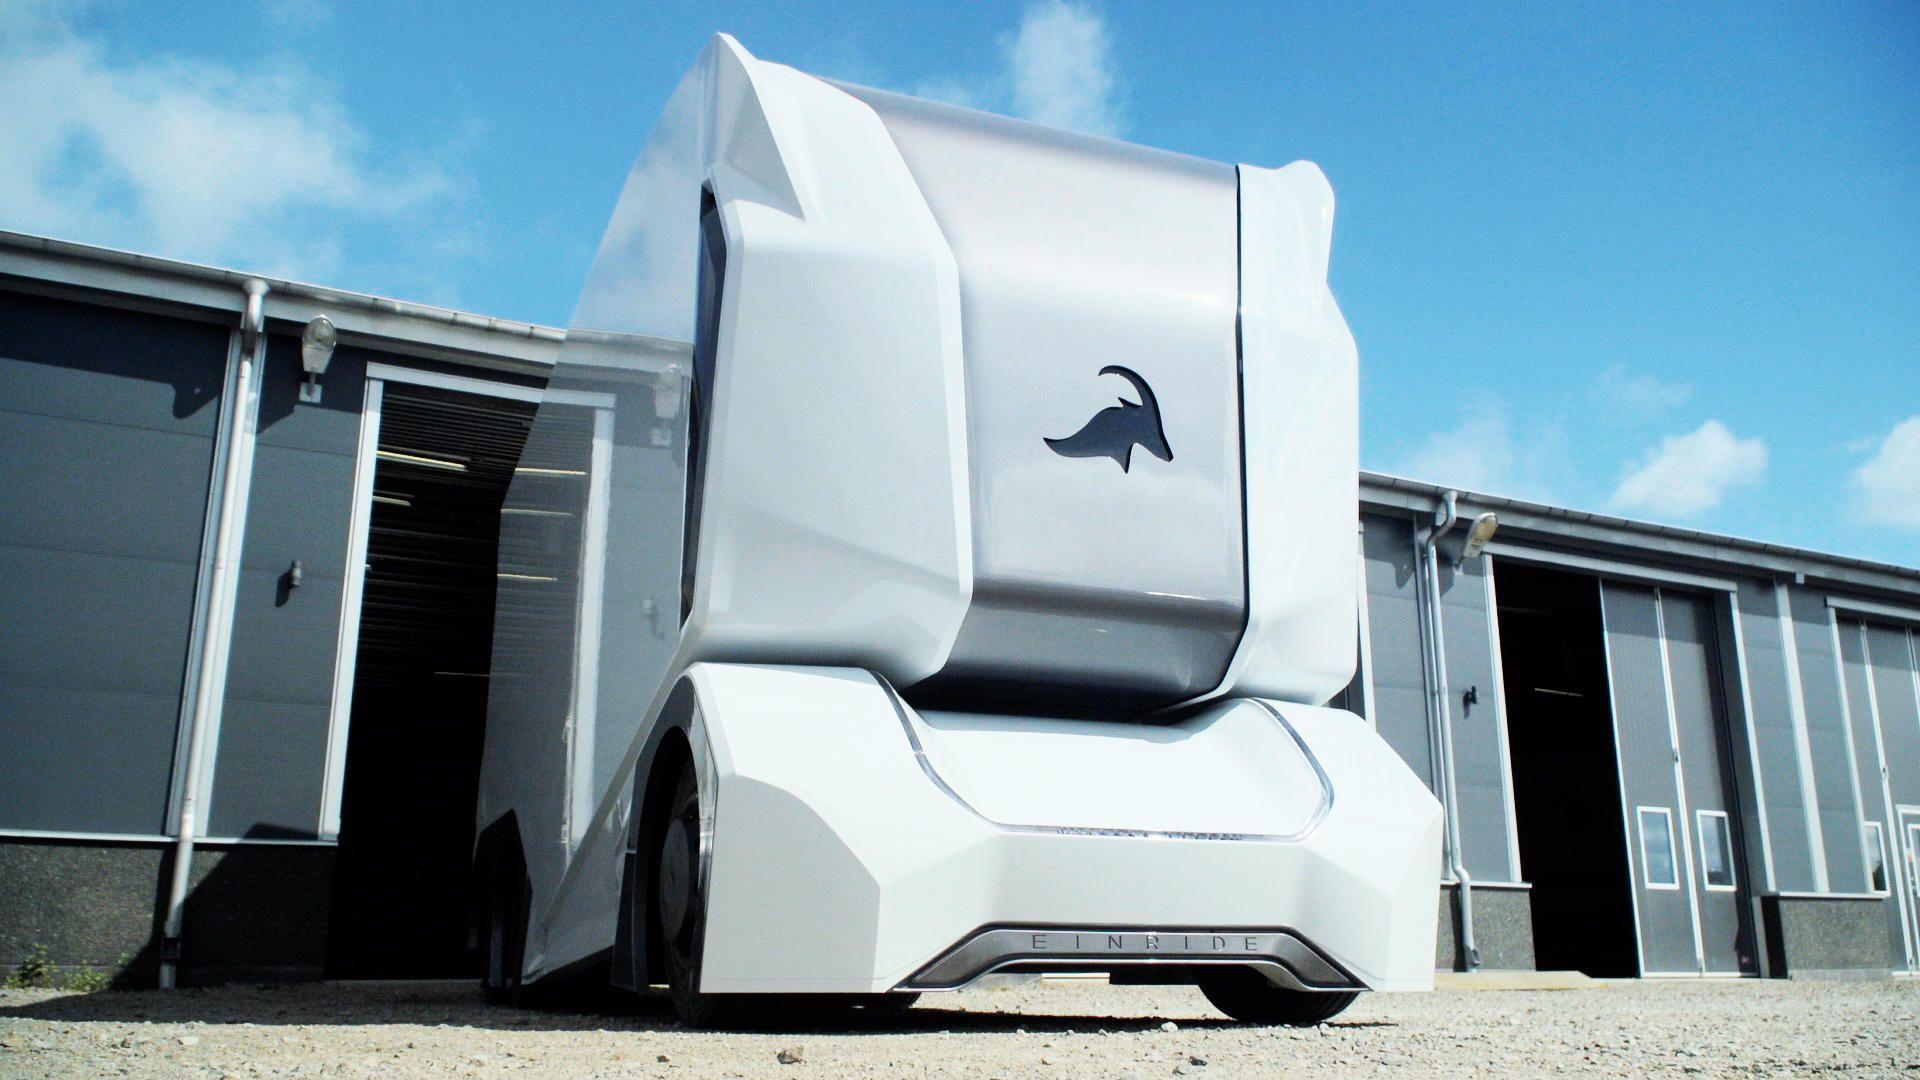 einride-self-driving-truck-prototype-1.jpg